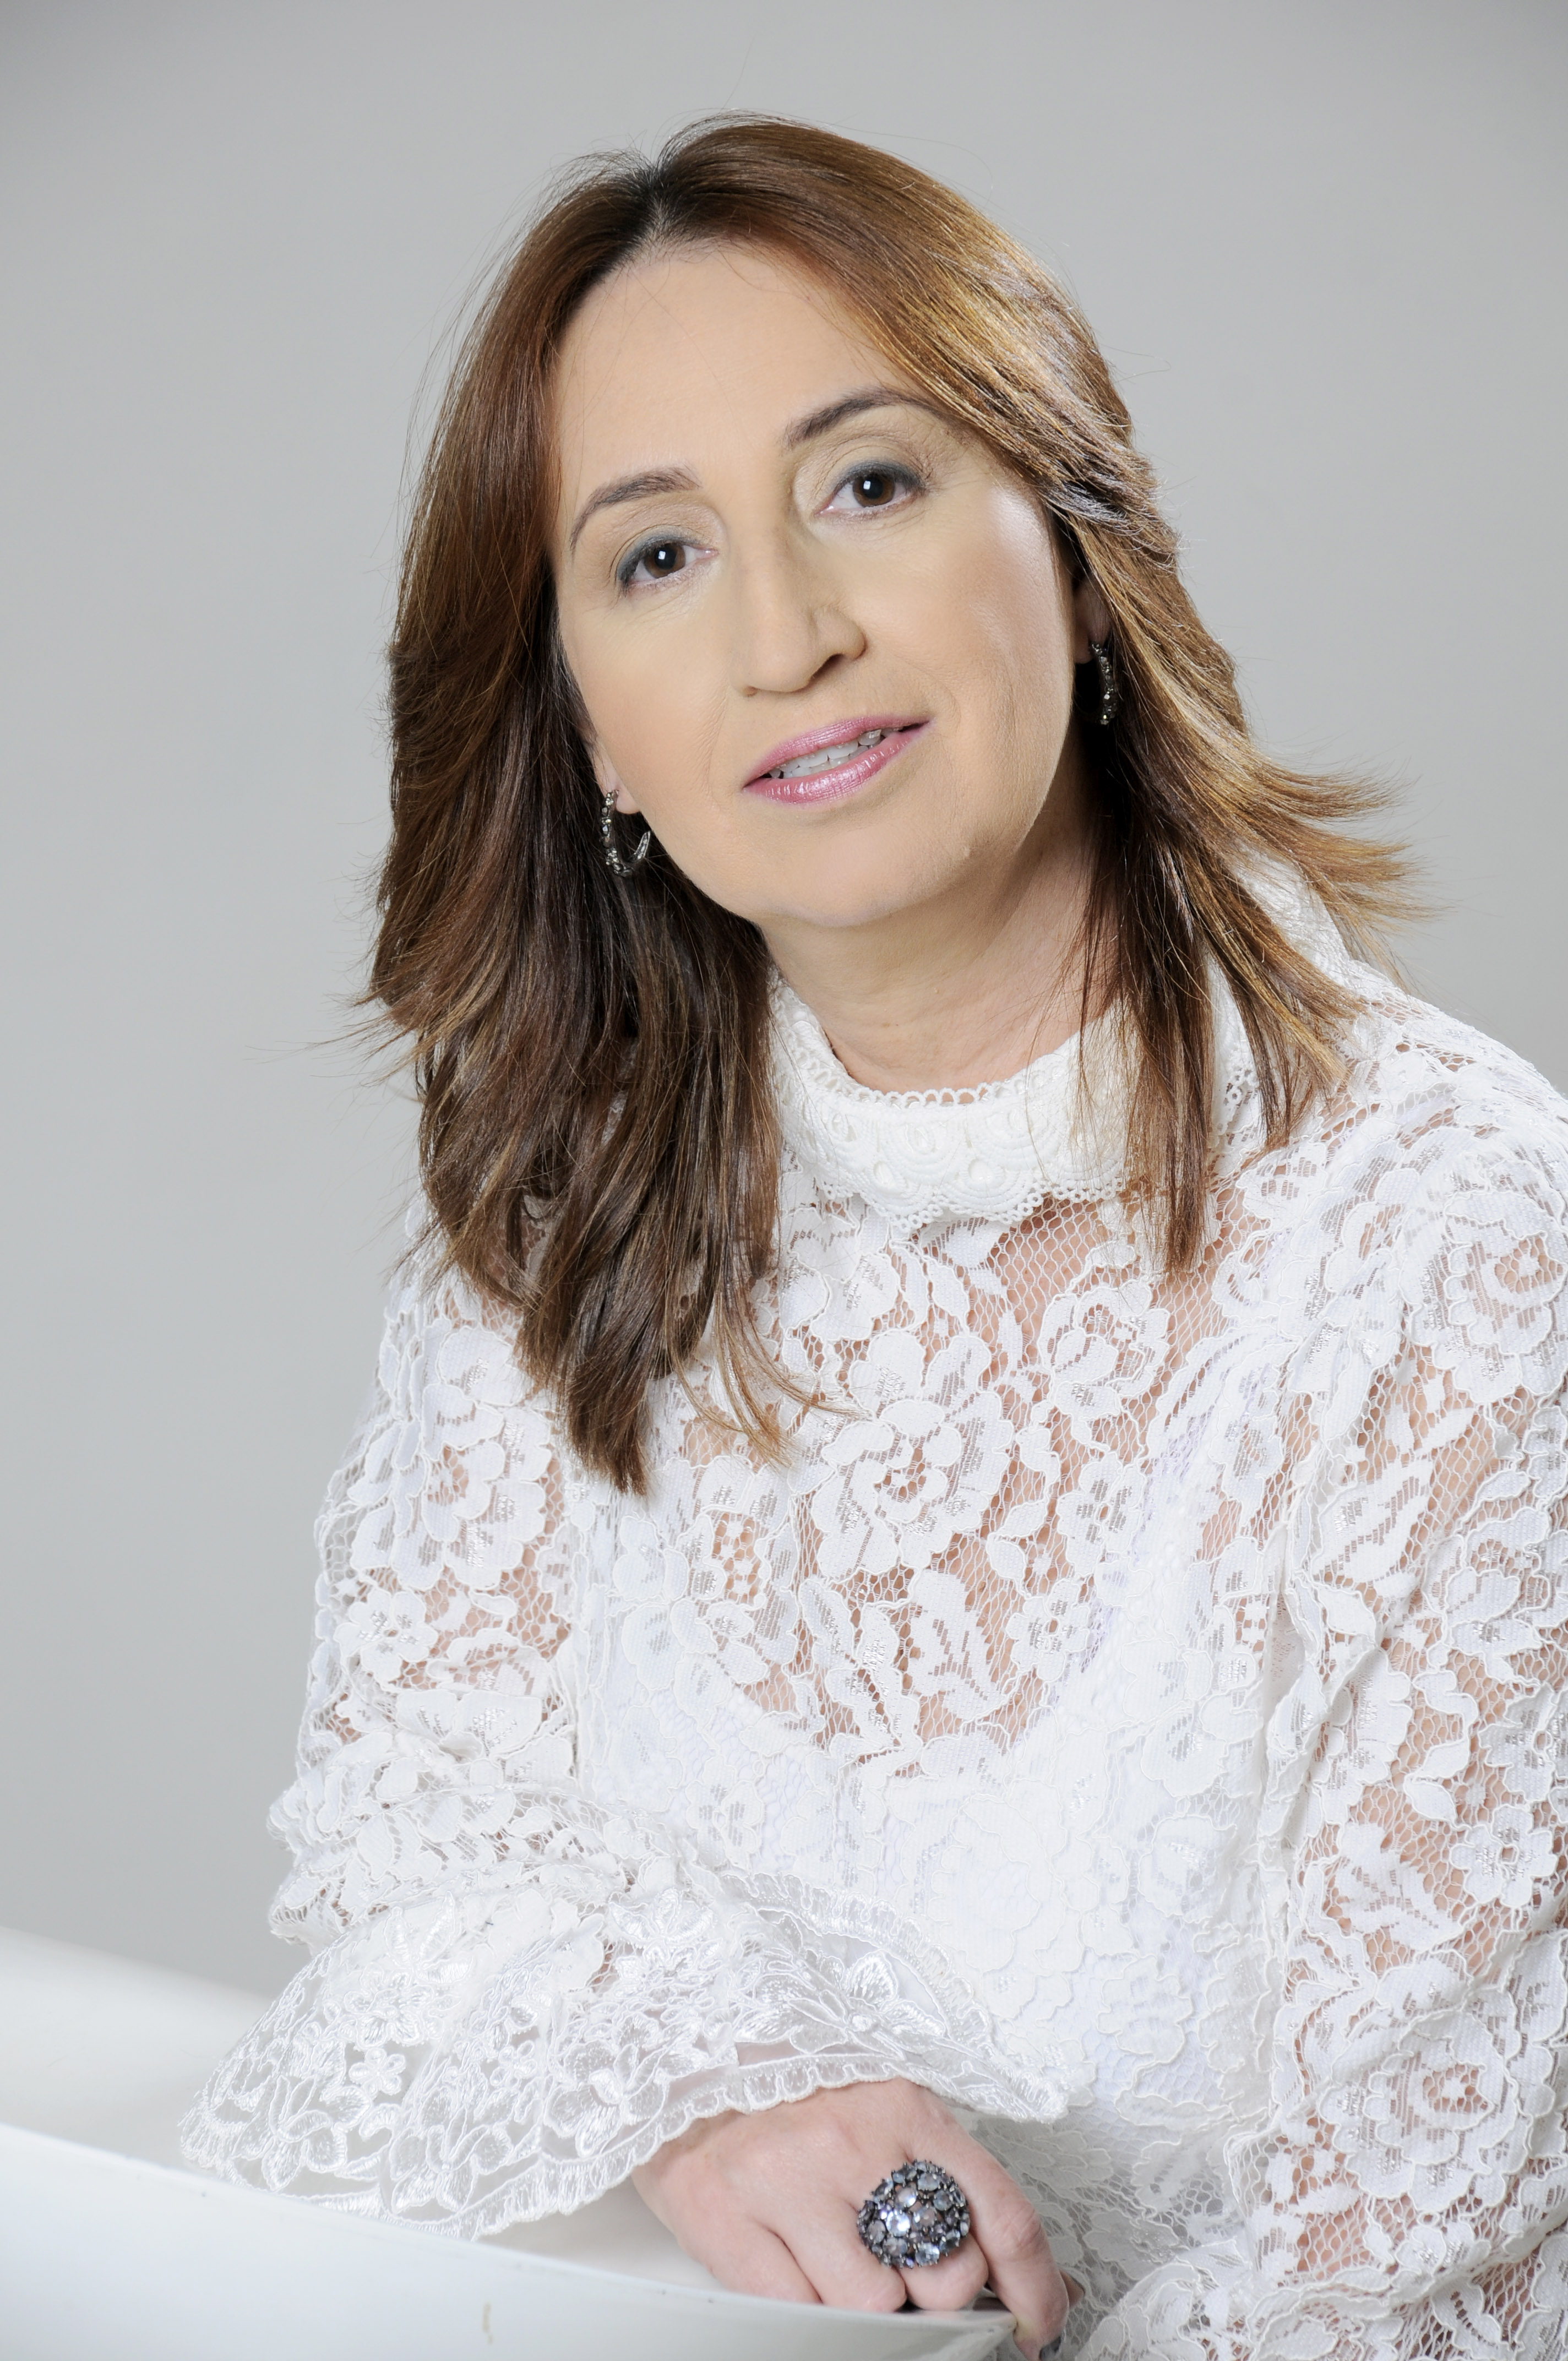 Adriana Menezes